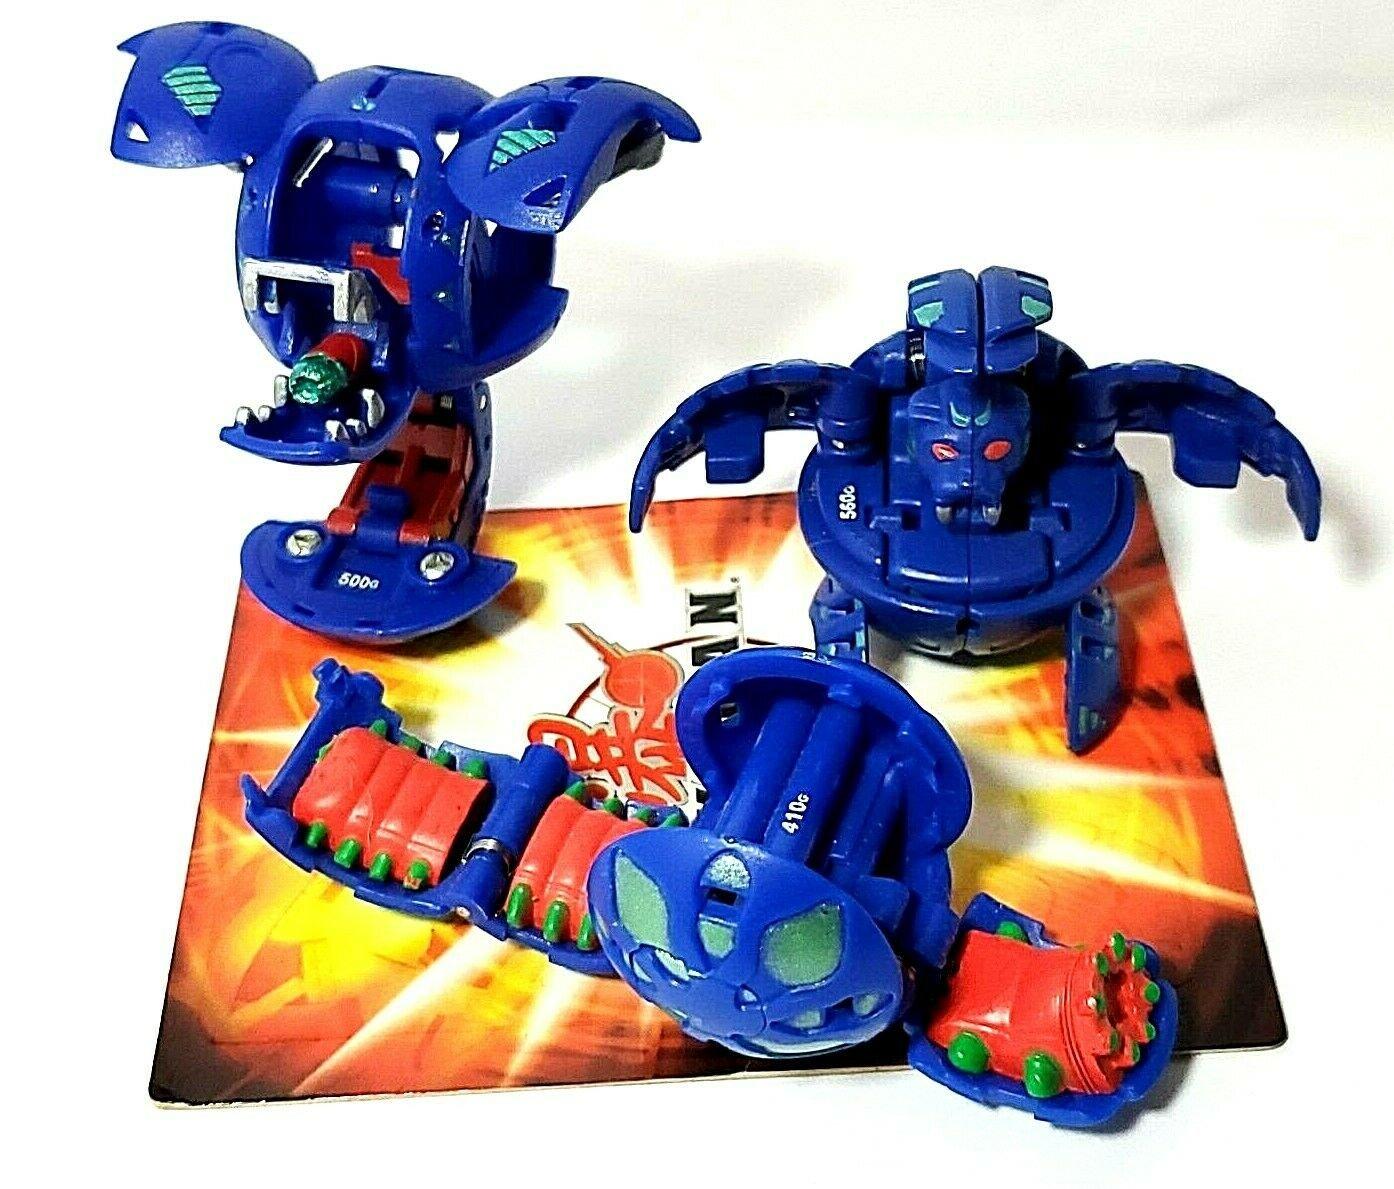 Bakugan Blue Aquos B2 lot of 3 blade tigerra 560g, leeform 500g, wormquake 4100g